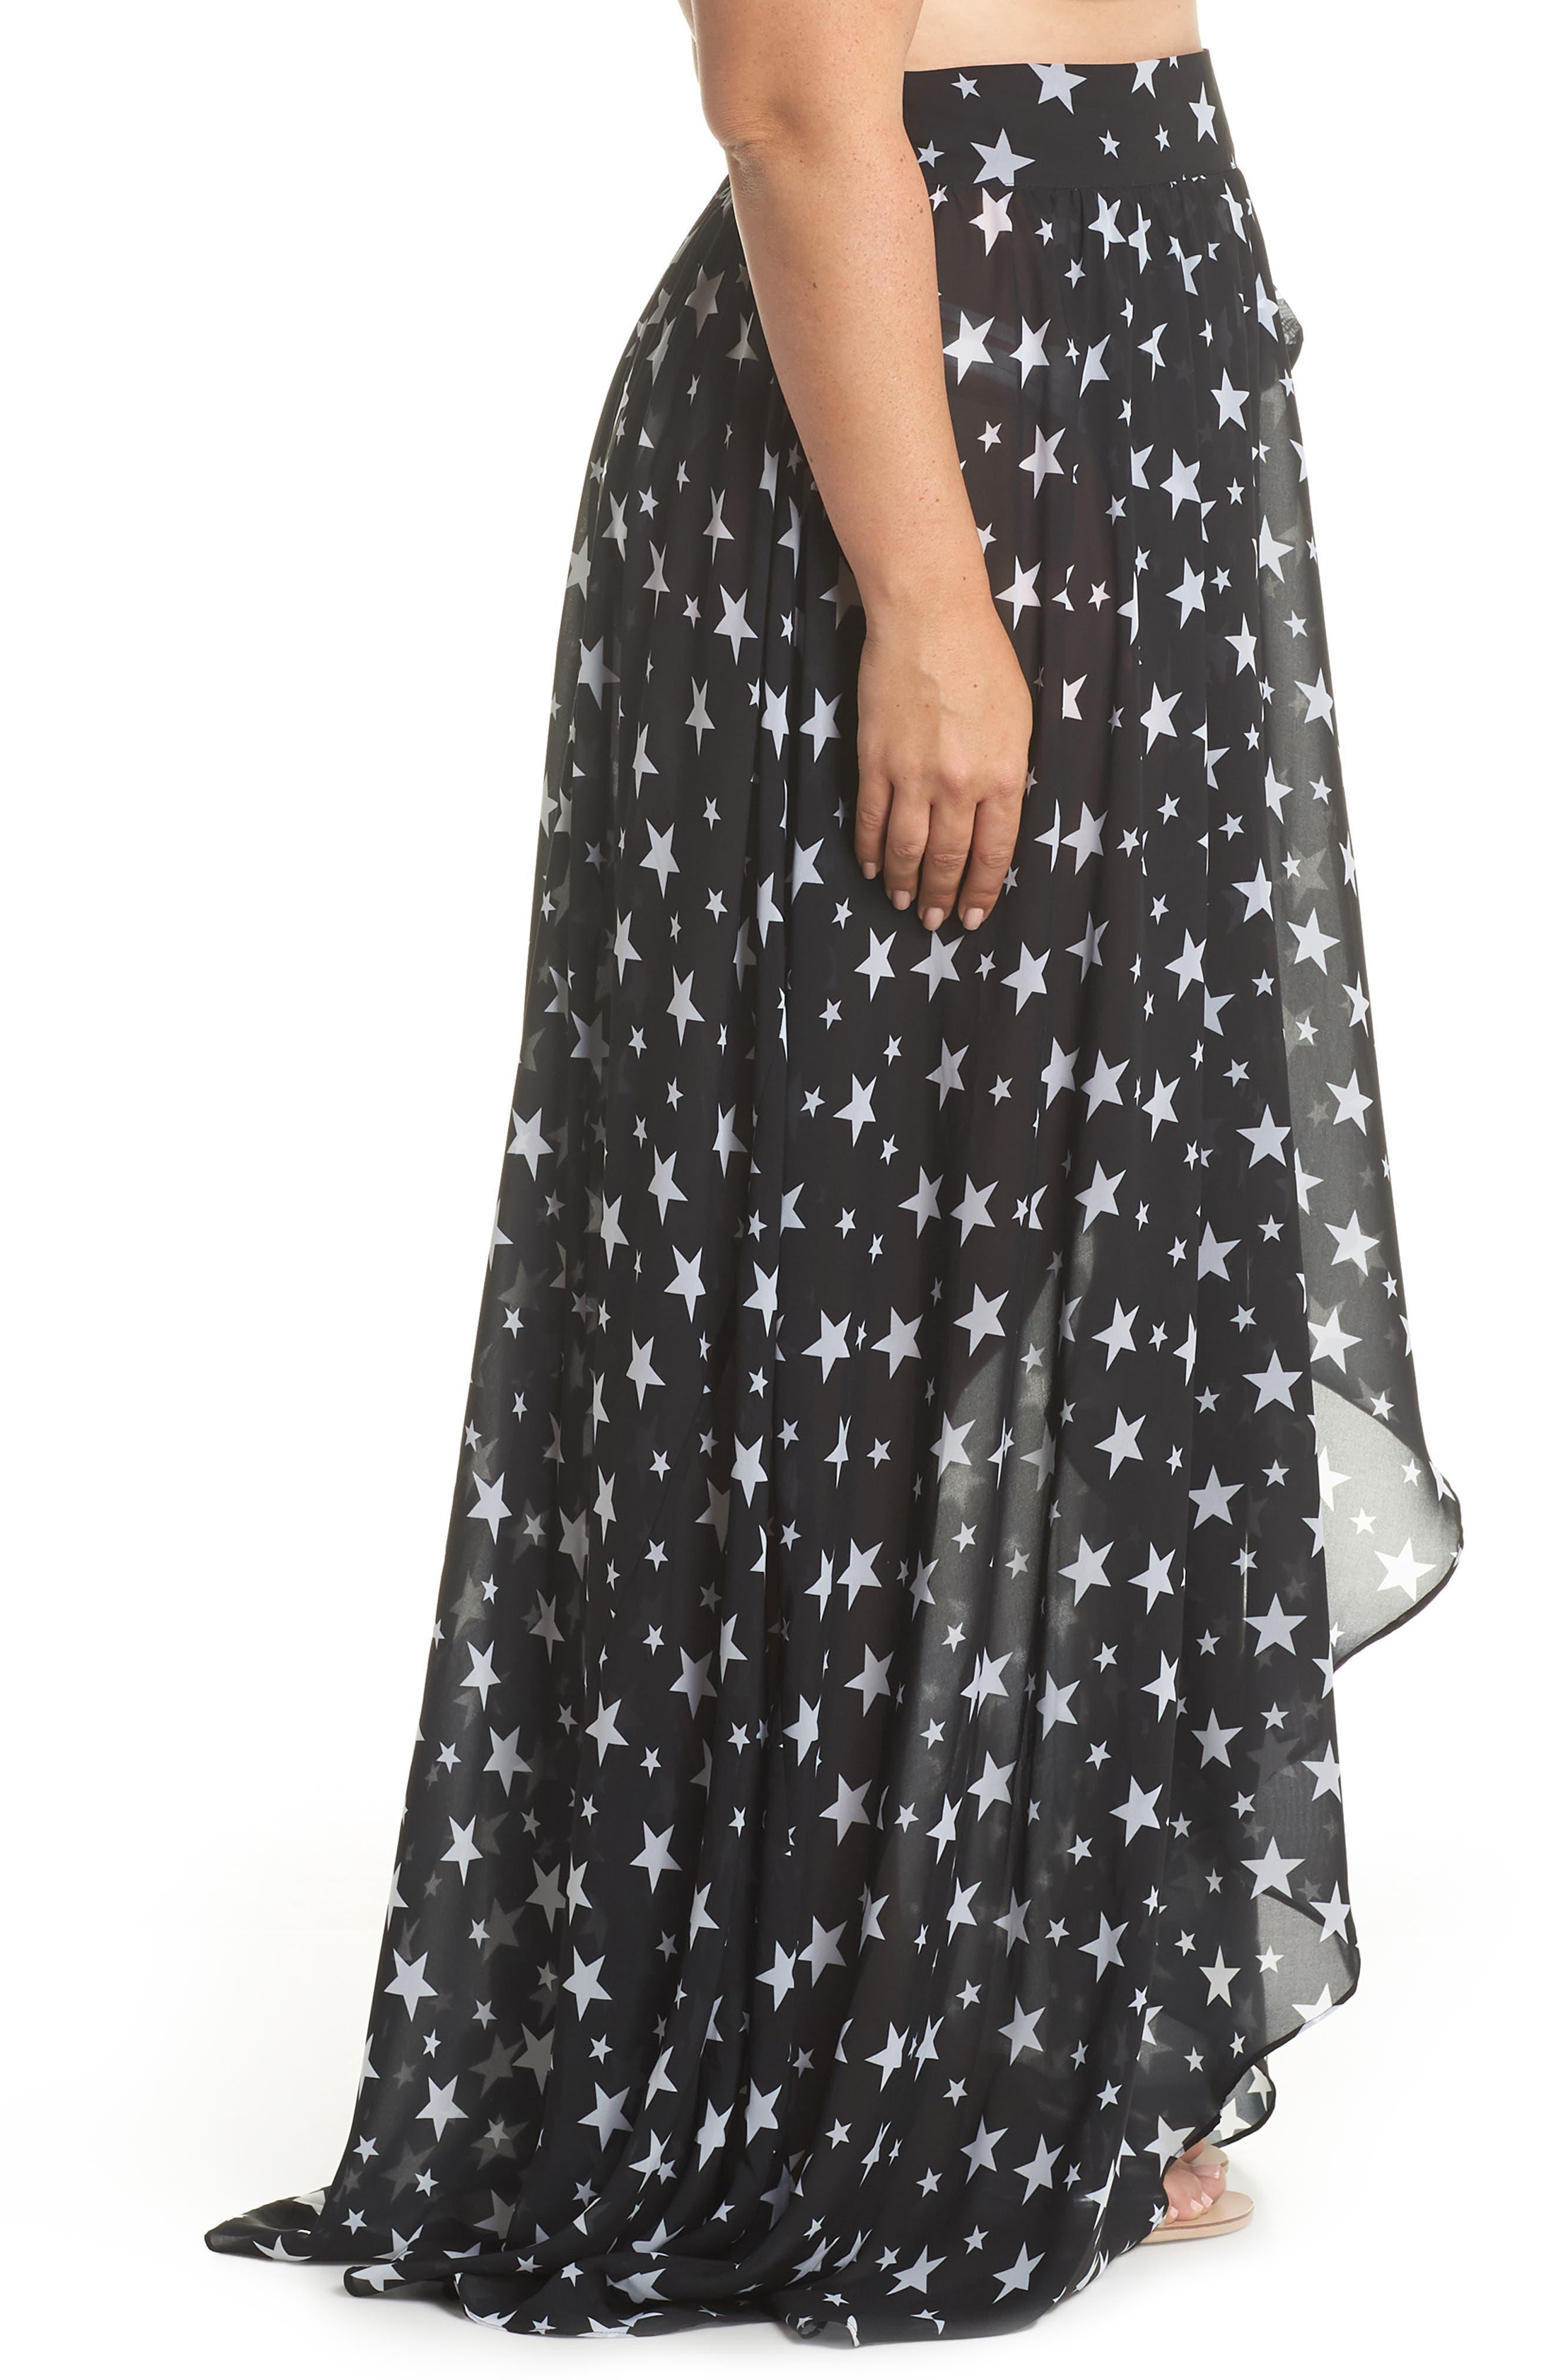 Cannes Cover-Up Skirt,                             Alternate thumbnail 3, color,                             Black Star